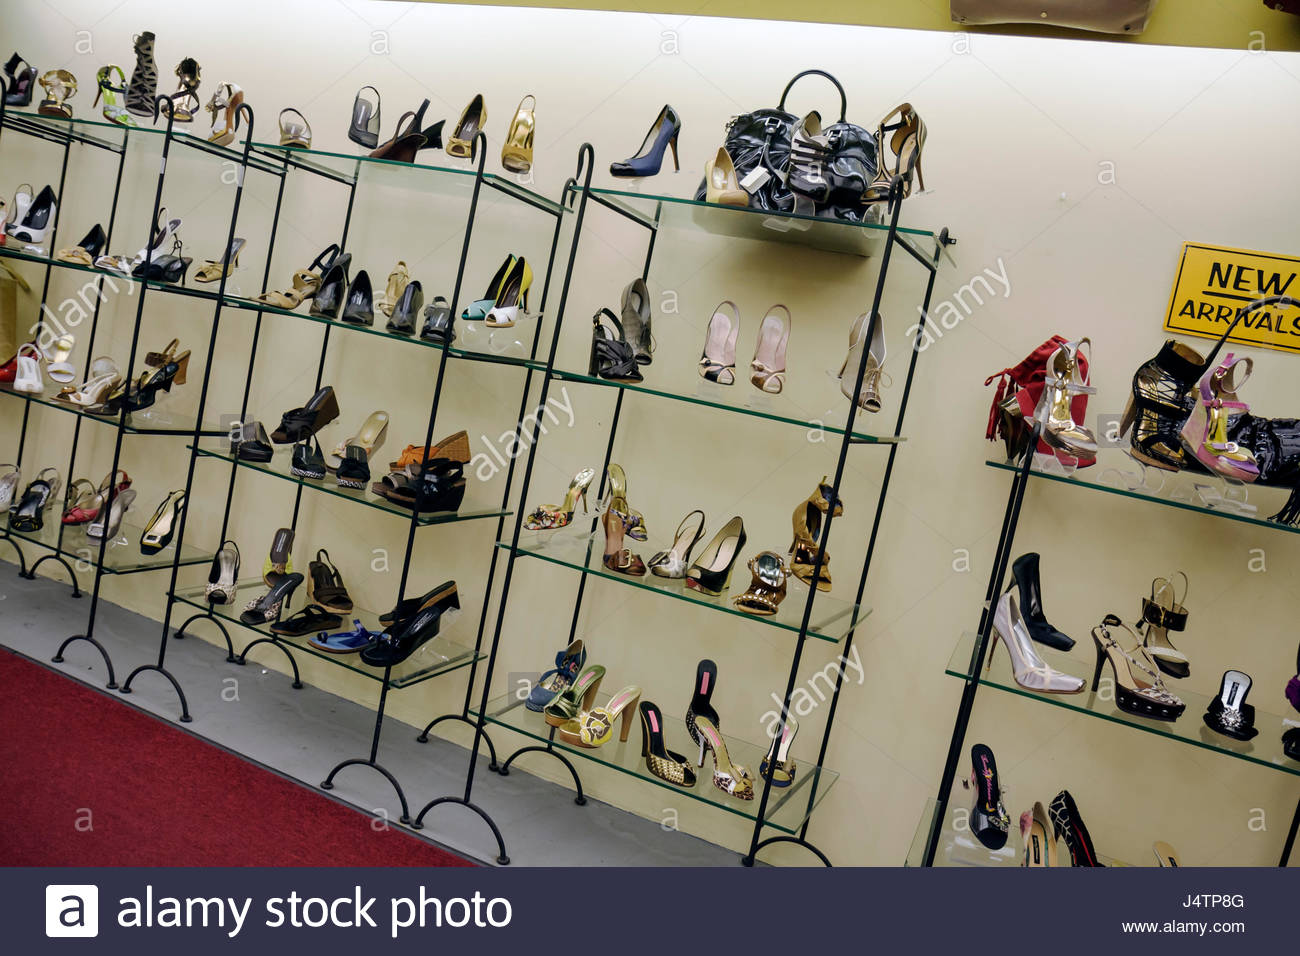 8152c40451d280 Miami Beach Florida Collins Avenue shopping fashion retail display boutique  small business shoe store shoes footwear women s fla